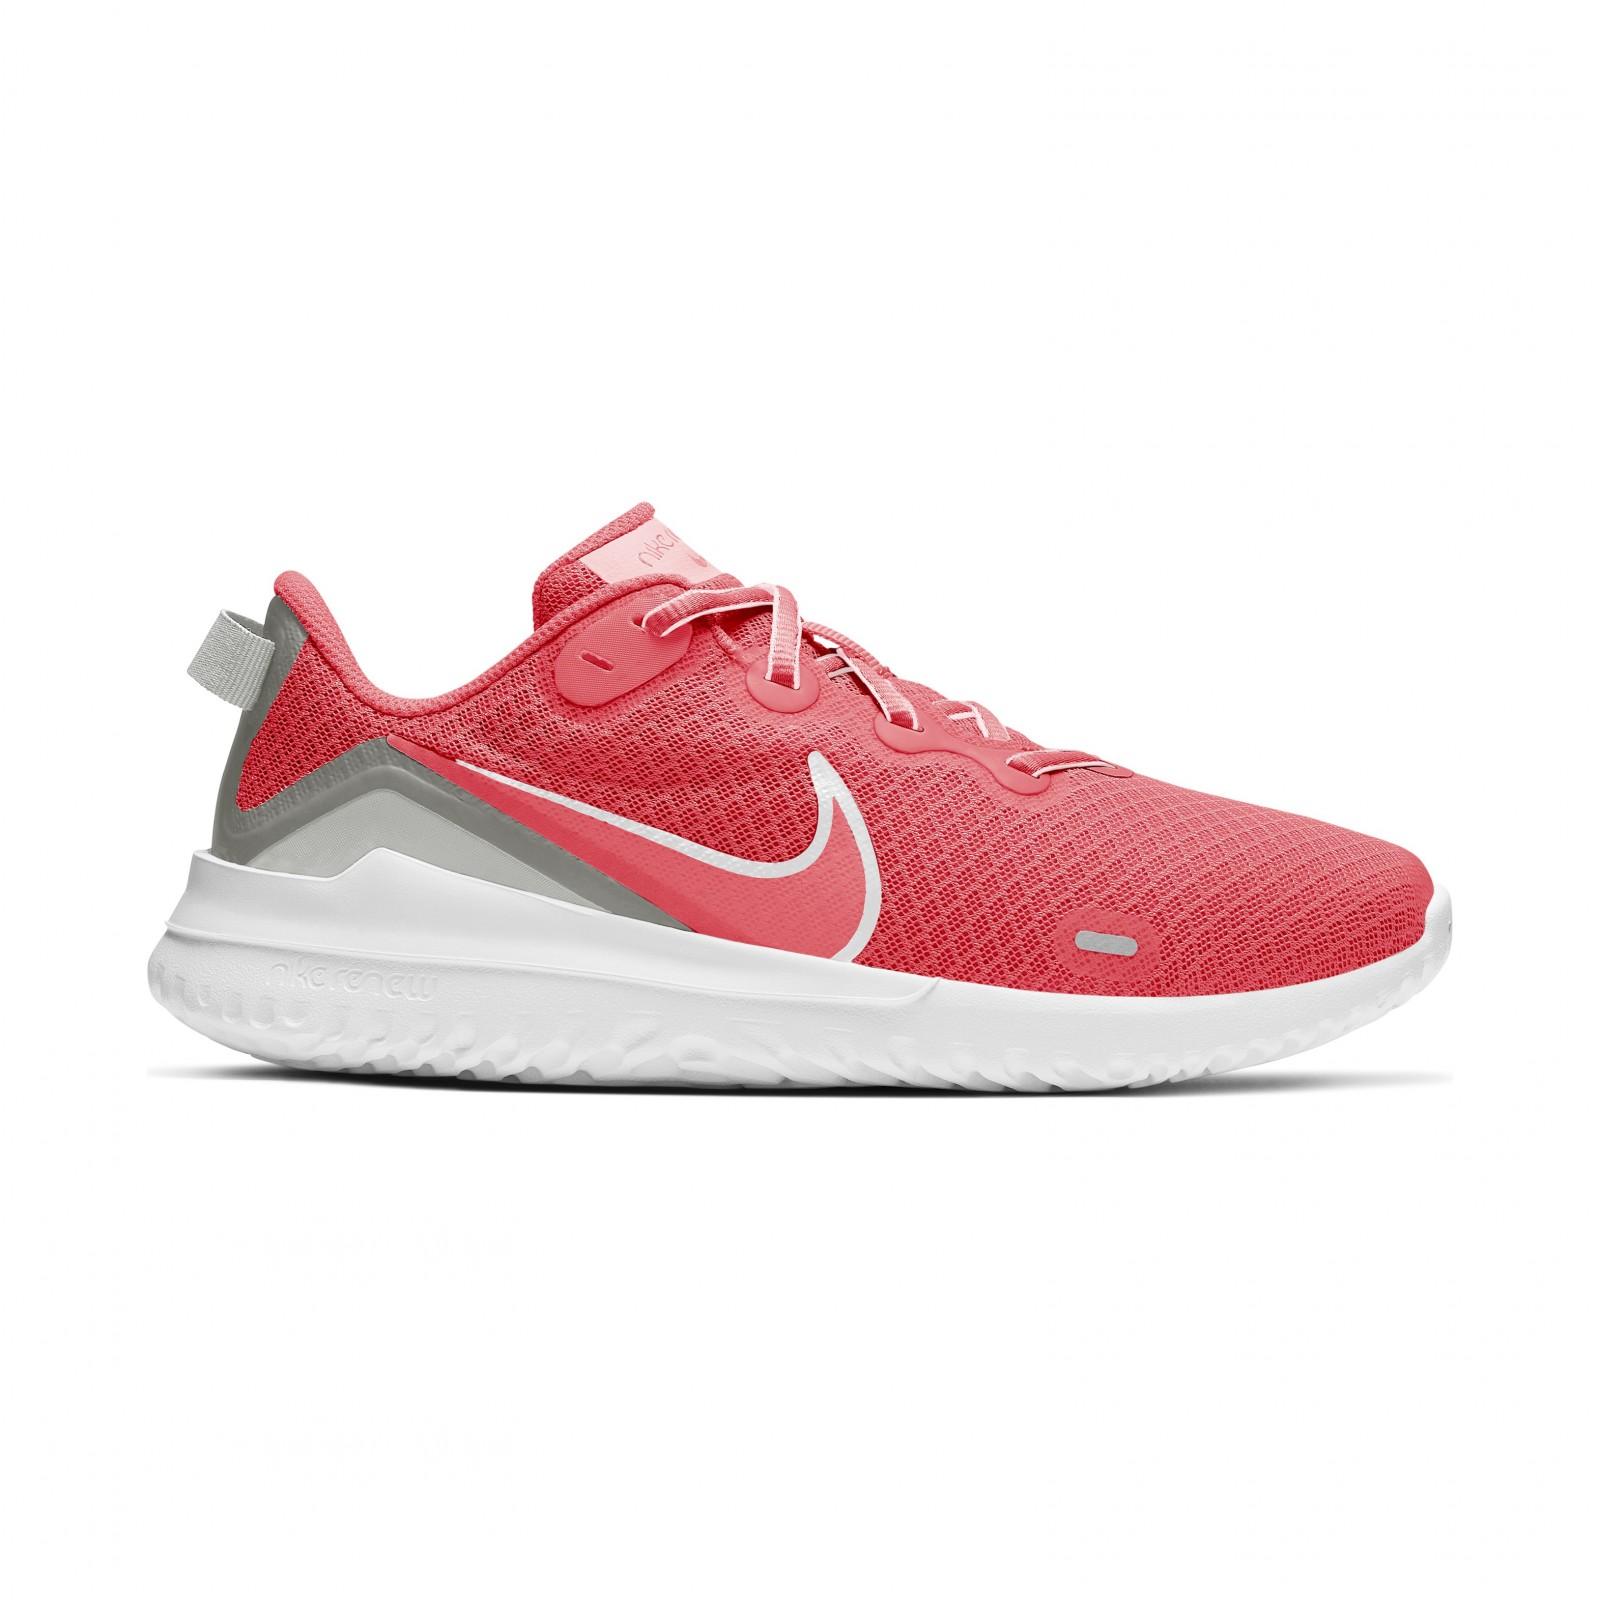 Nike Renew Ride FLASH CRIMSON/WHITE-VAST GREY